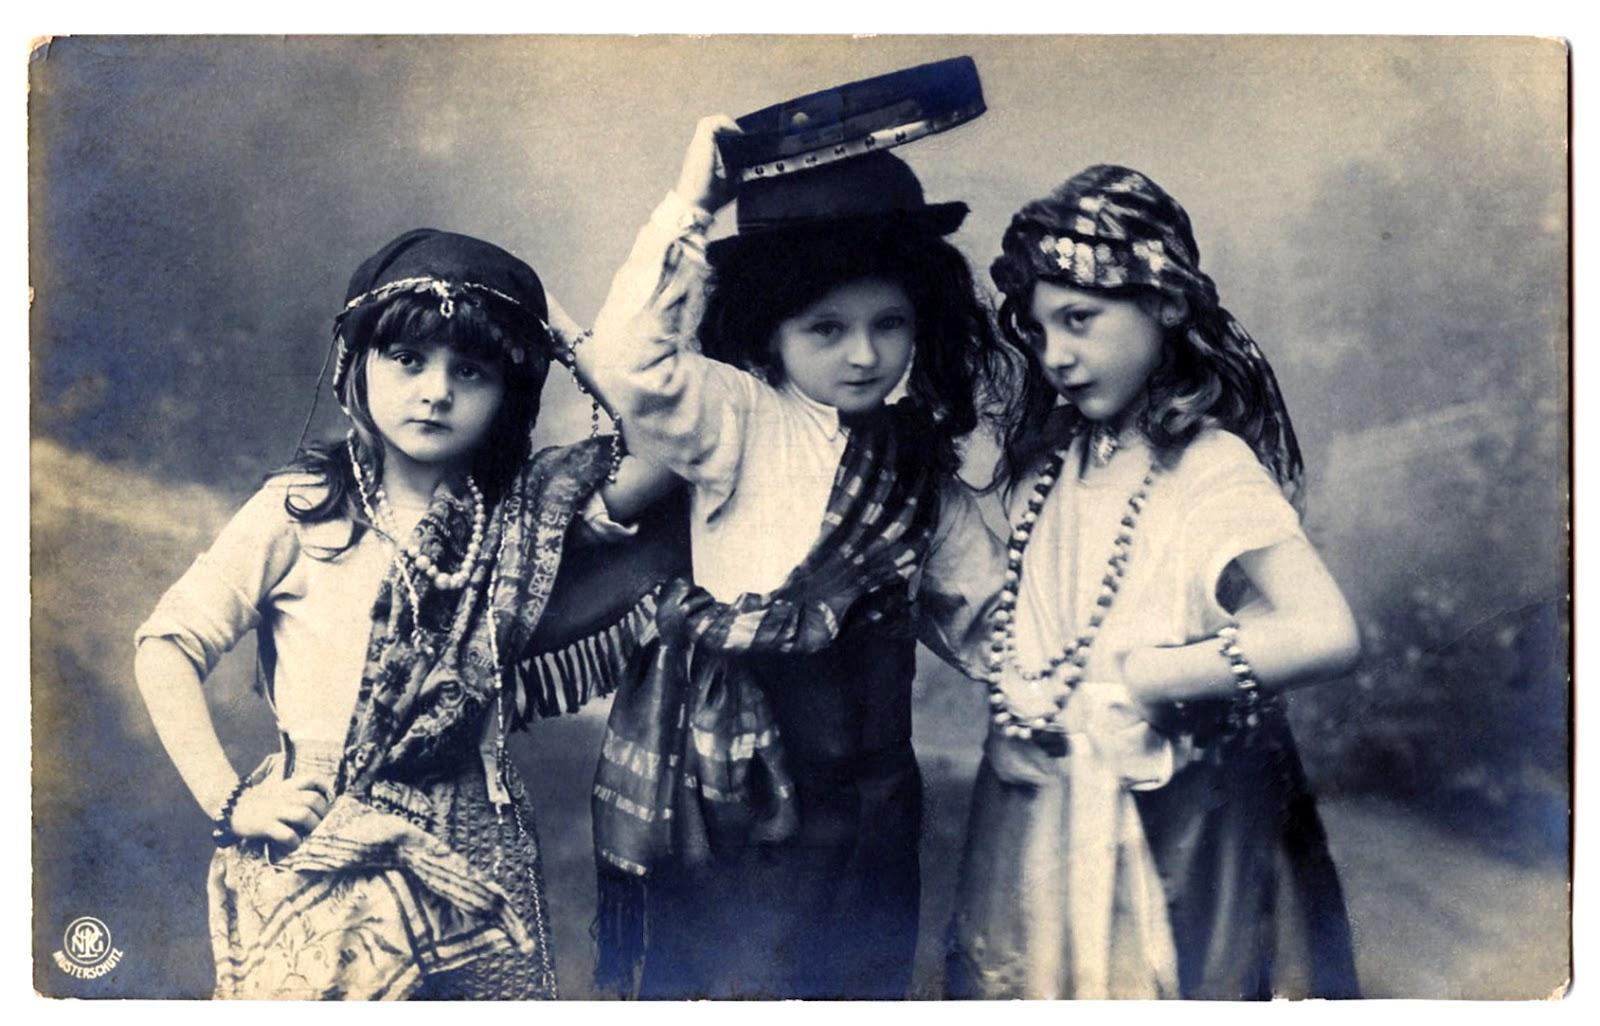 Gypsy Girl Vintage Adventures June 2013